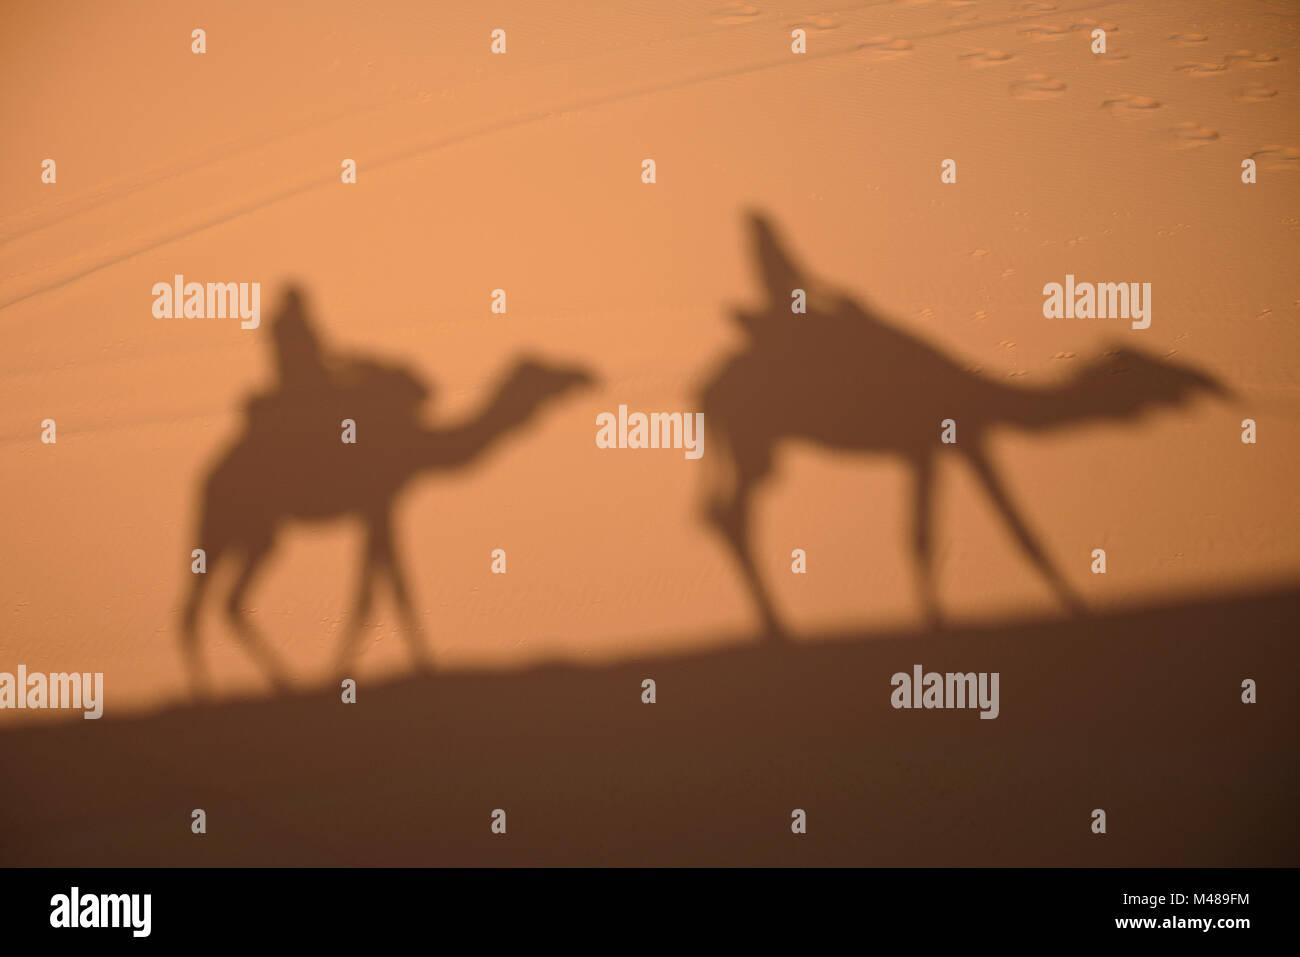 Camel shadows on Sahara Desert sand in Morocco. Stock Photo